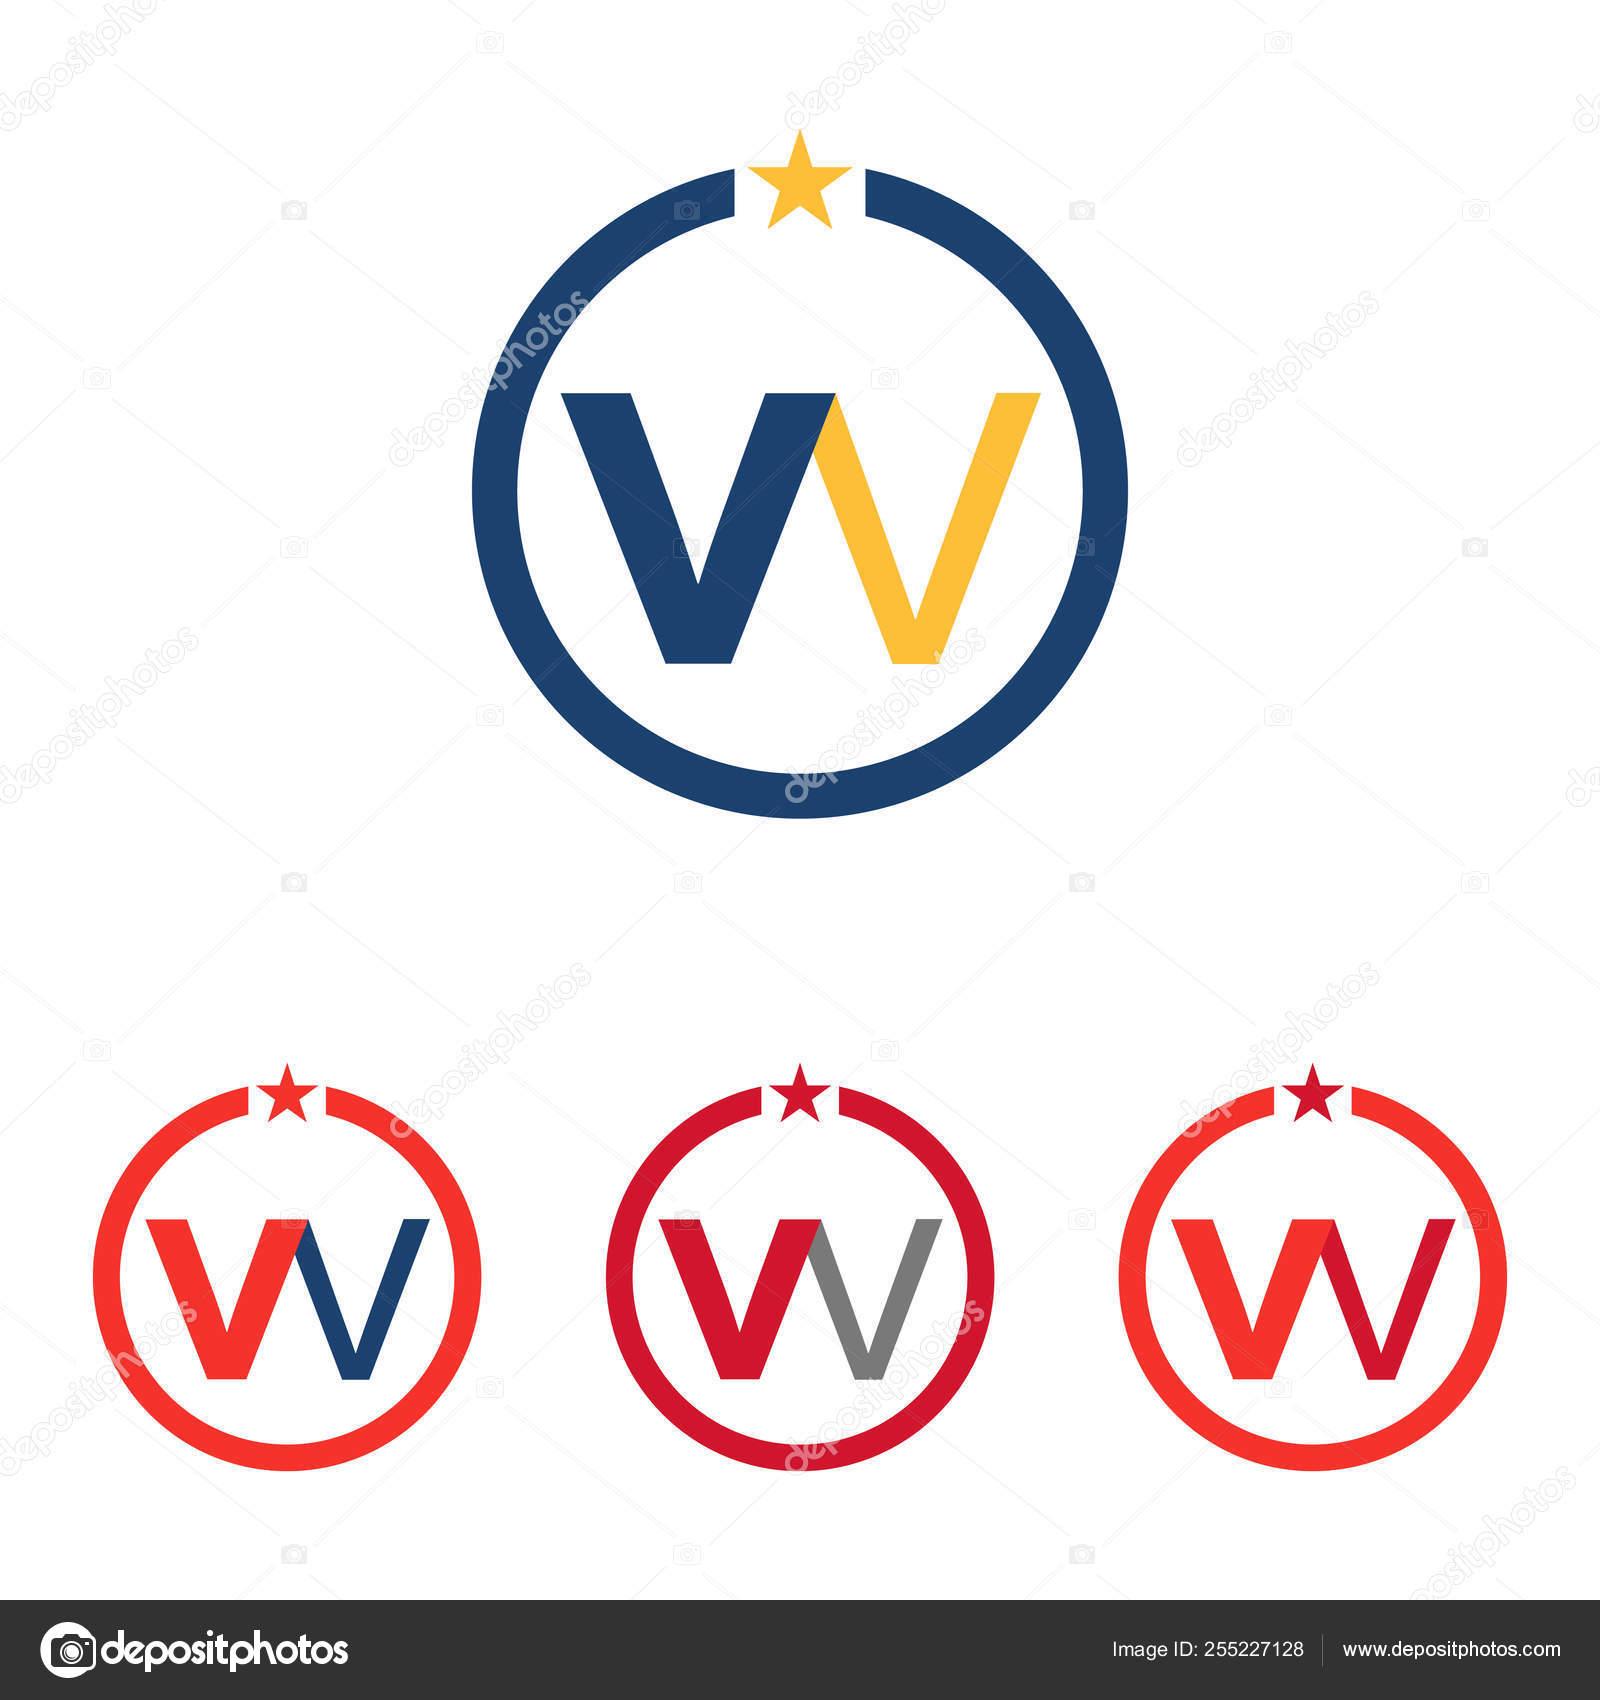 W - WV - VW Circle Star Logo Symbol Template — Stock Vector